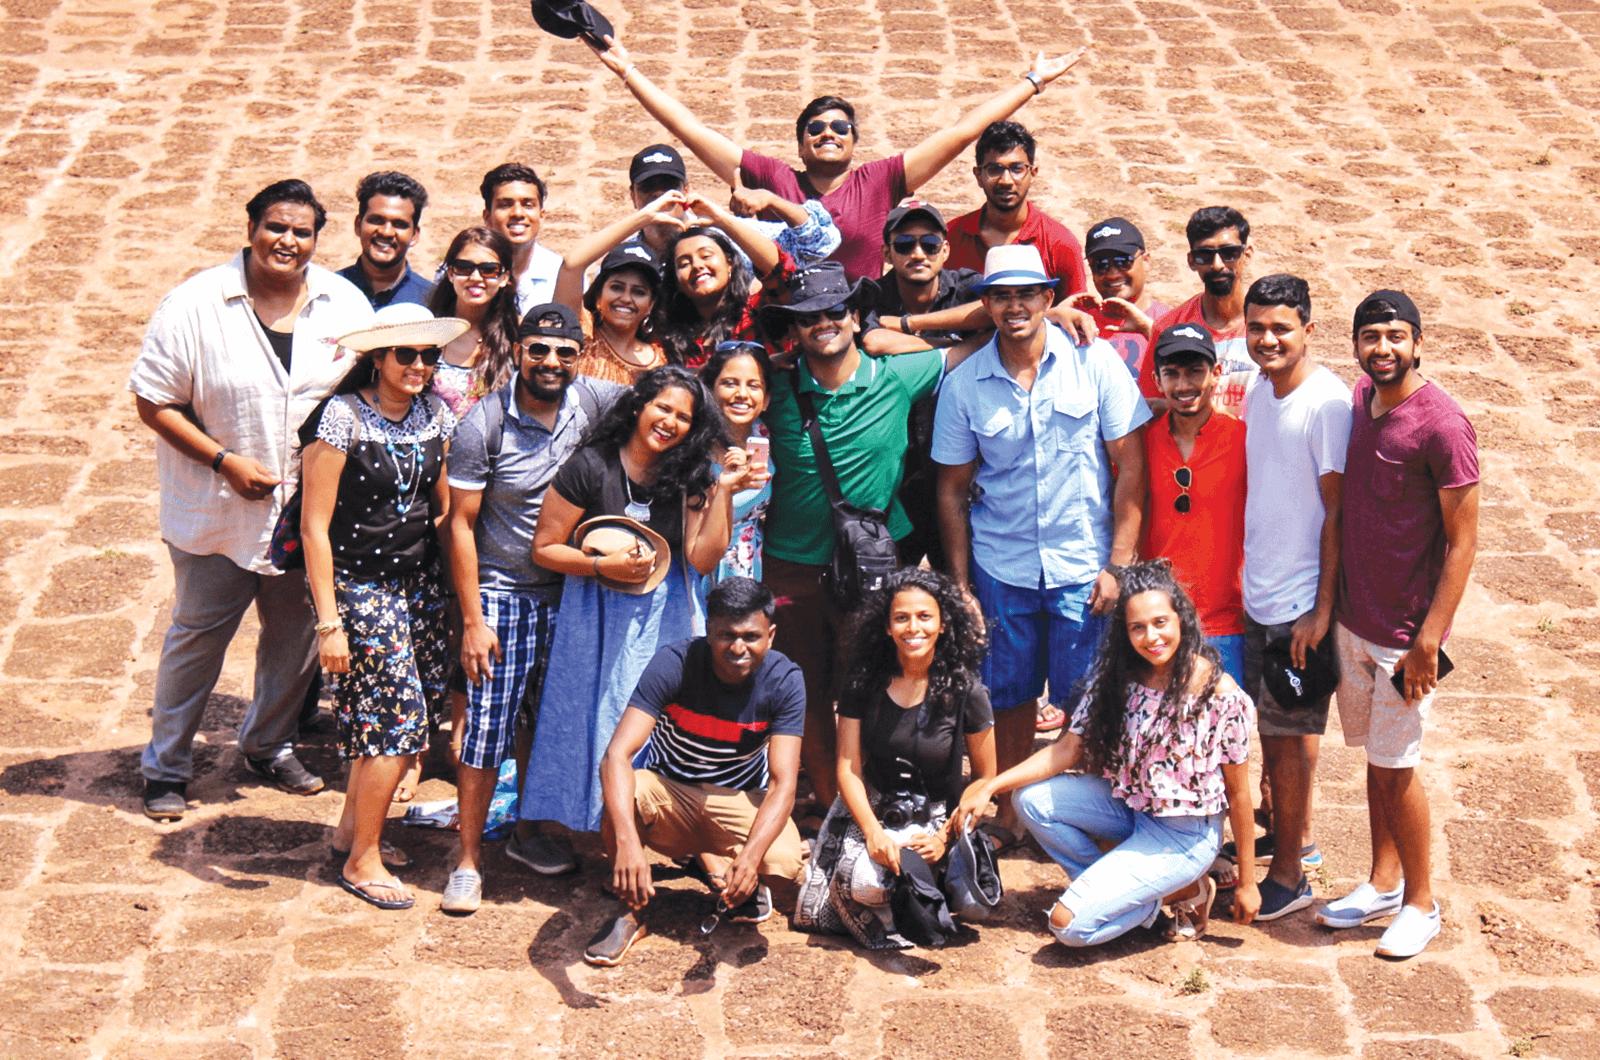 Group of Toastmasters members posing in Goa, India